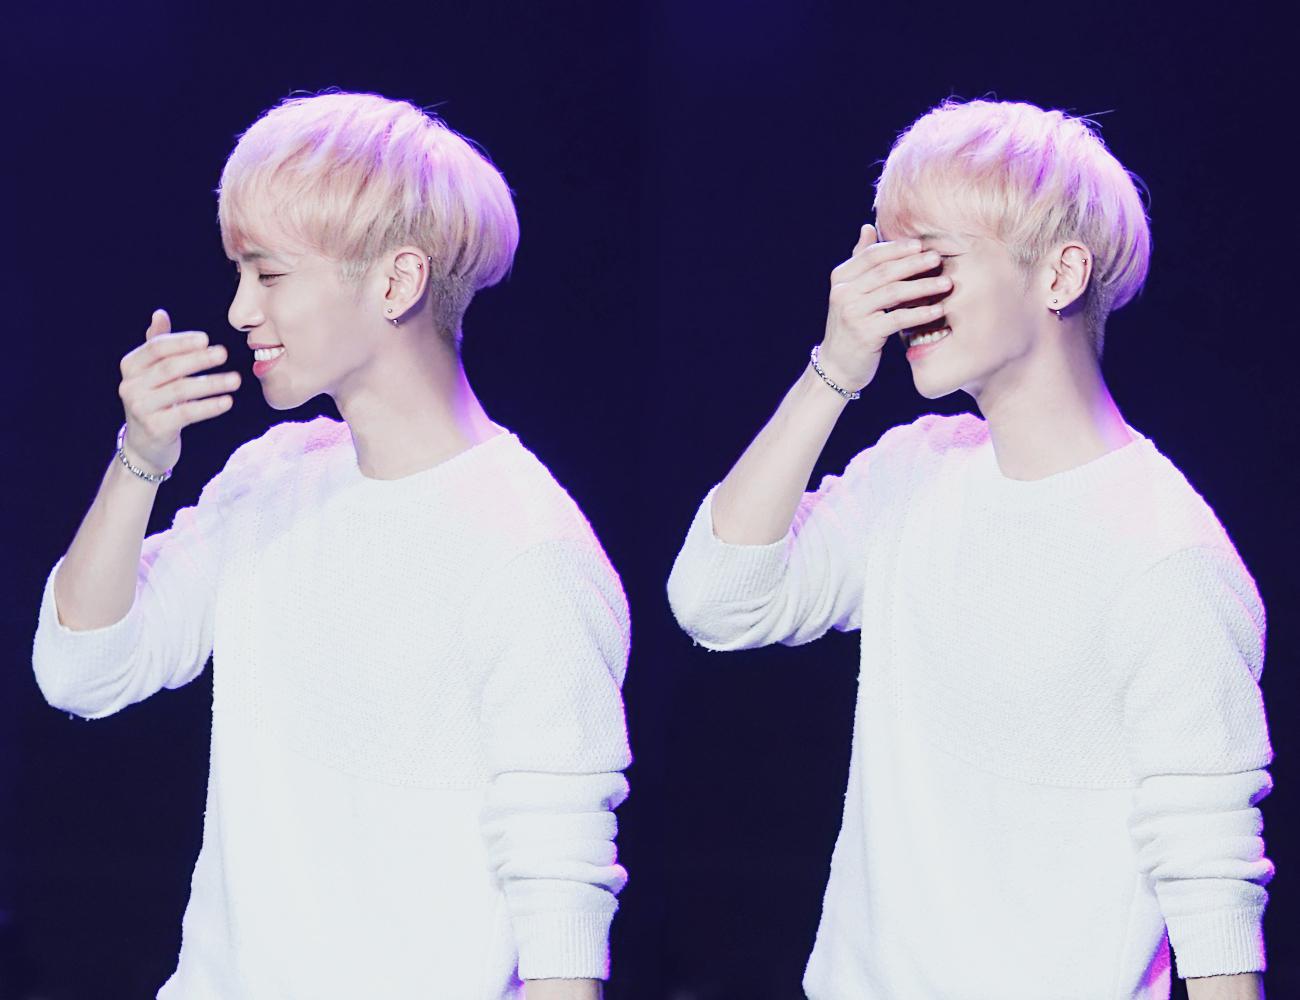 160426 Jonghyun @ MBC Live Concert - Blue Night 26613232911_3bf11c0009_o